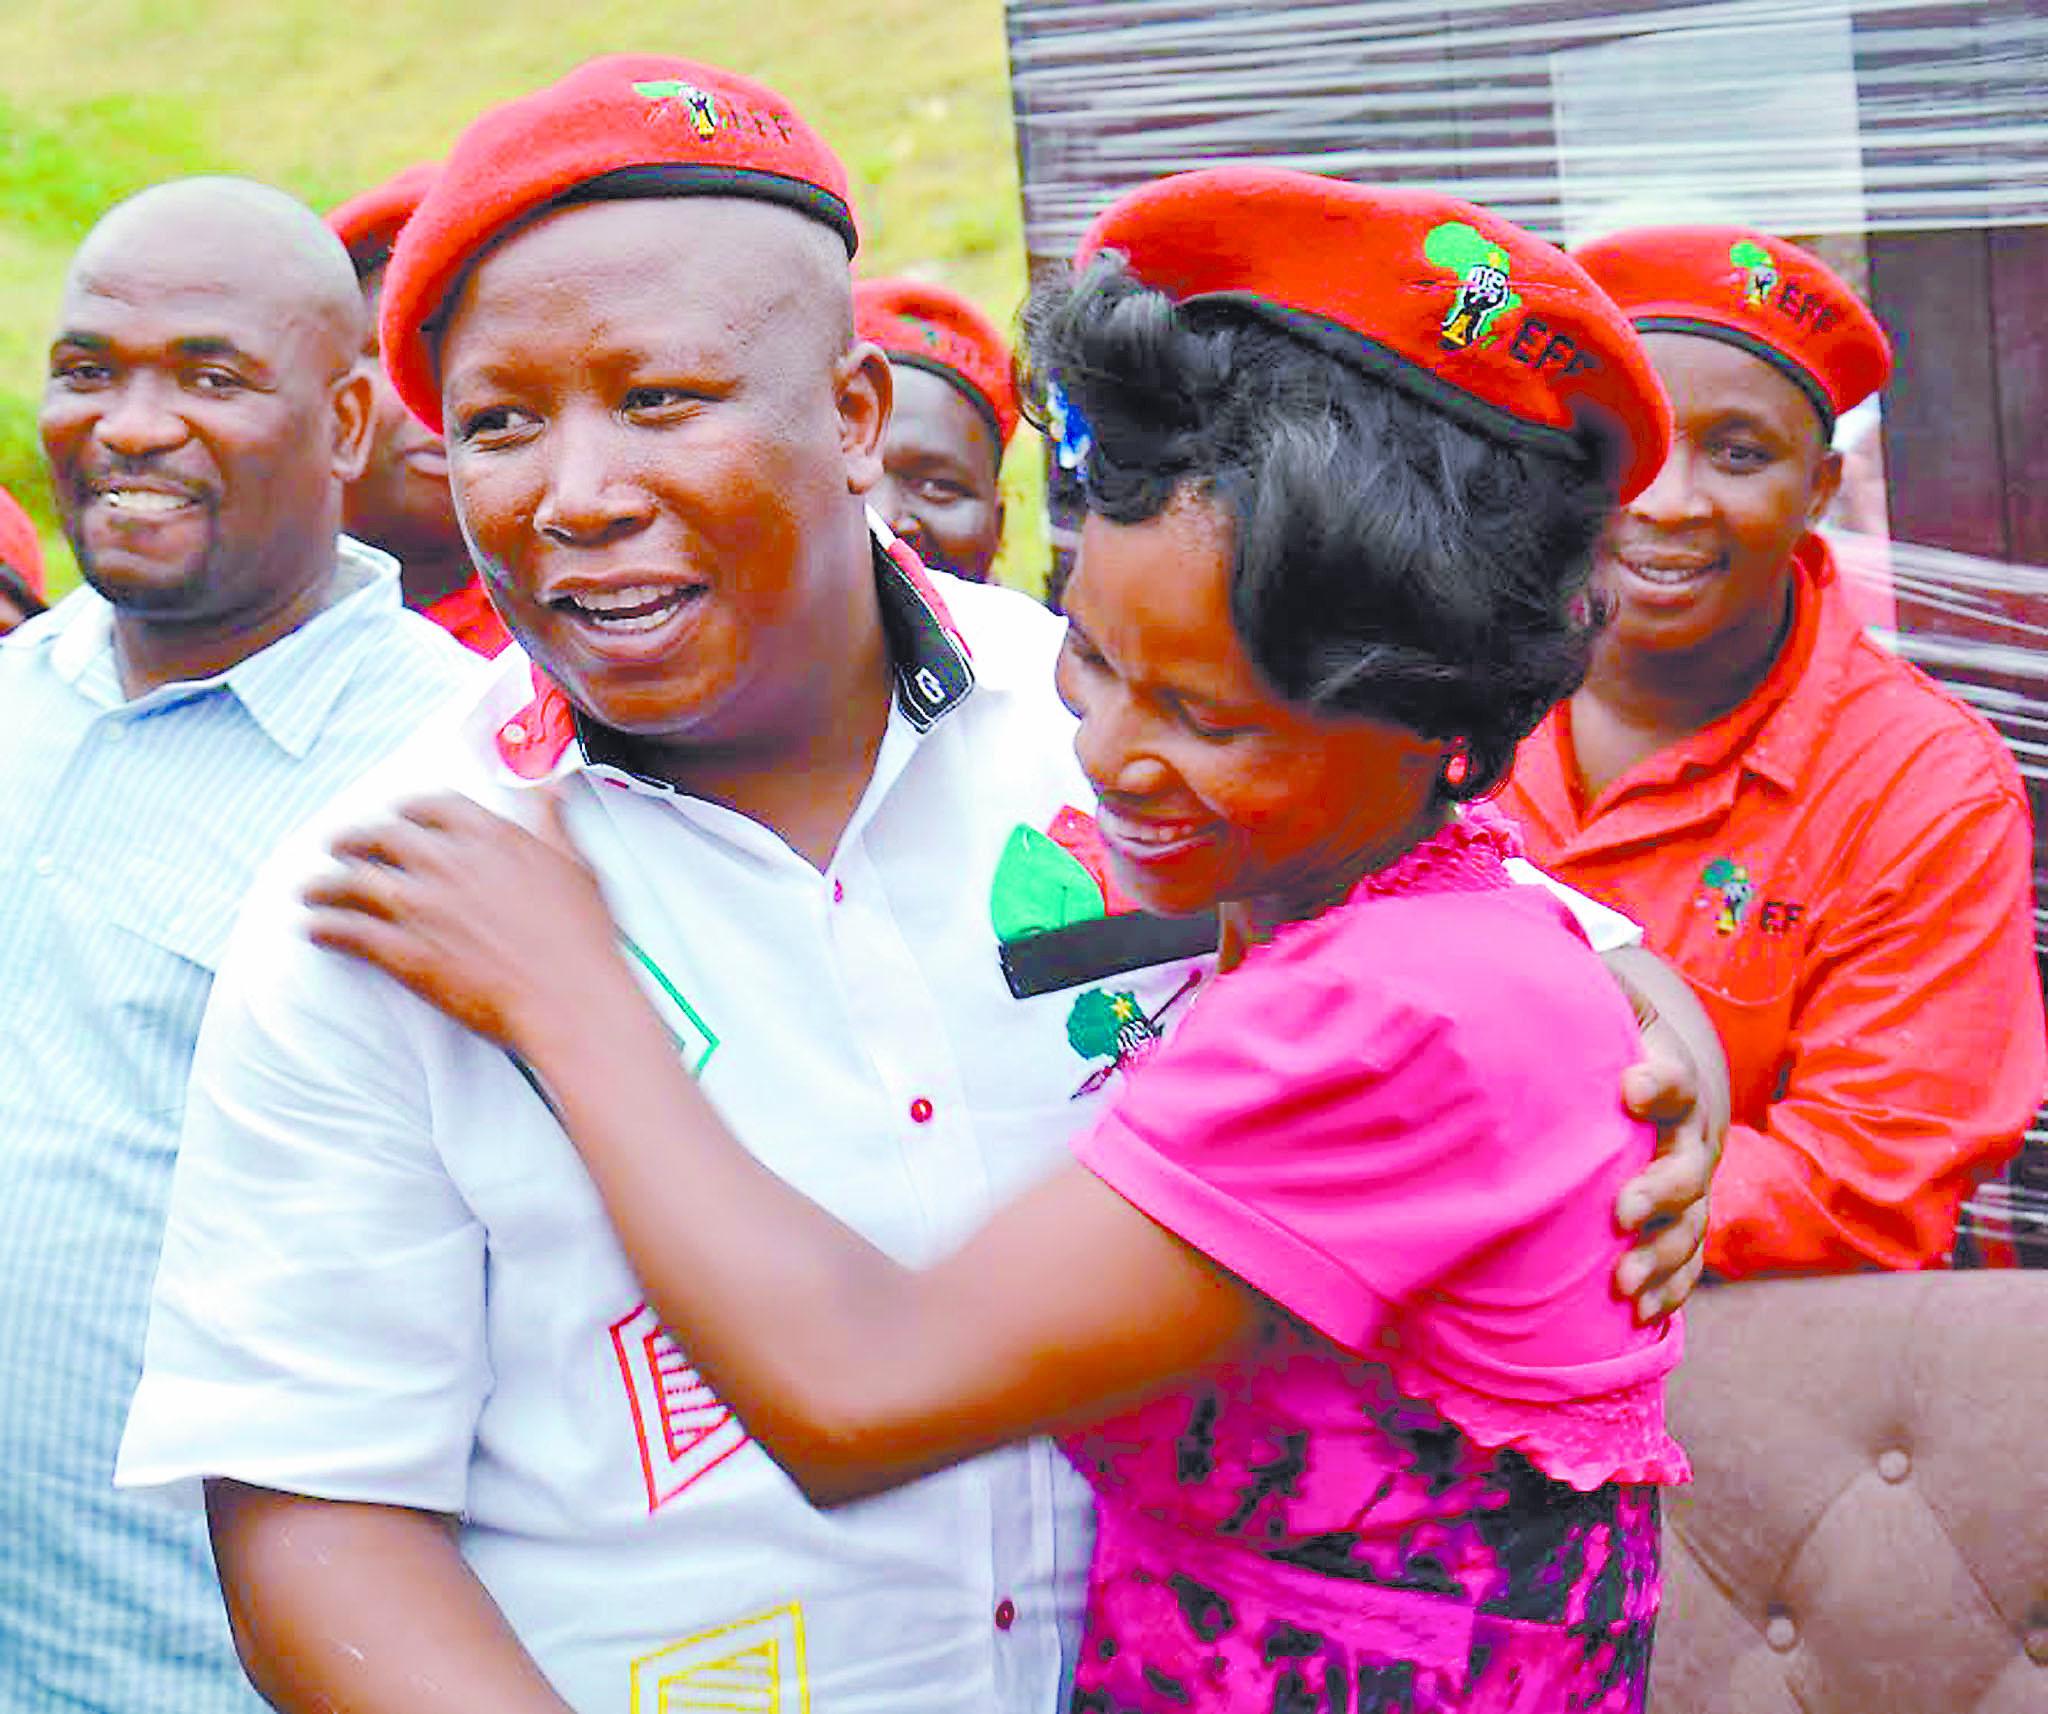 Residents harass new Nkandla home owner